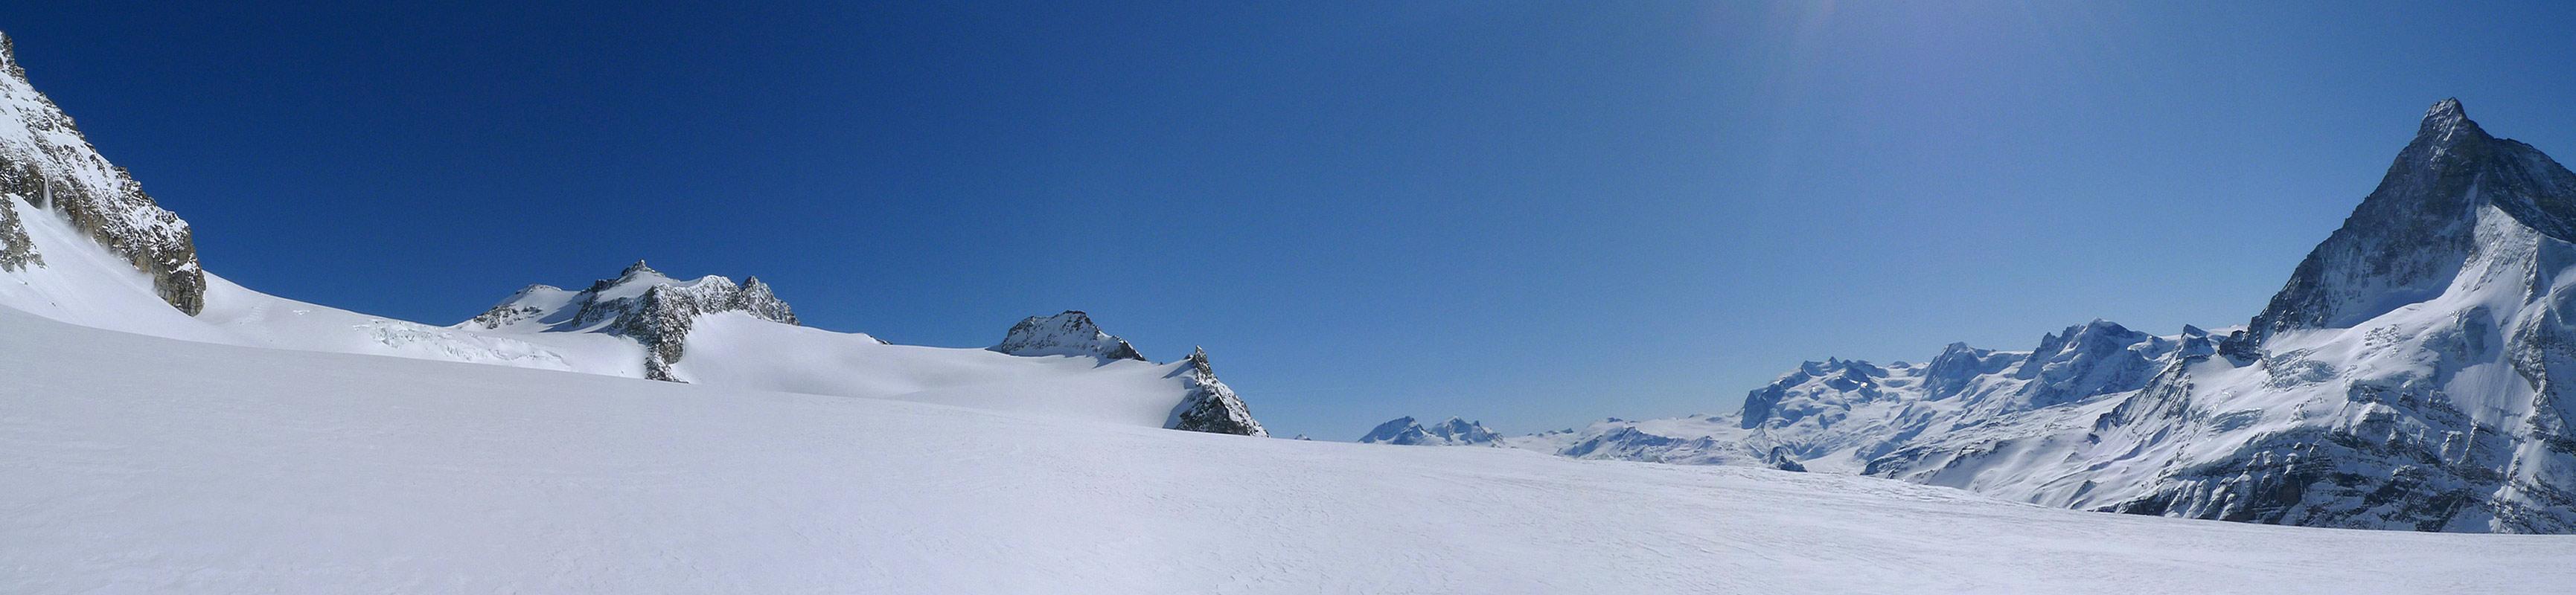 Mont Durand / Arbenhorn Walliser Alpen / Alpes valaisannes Schweiz panorama 45